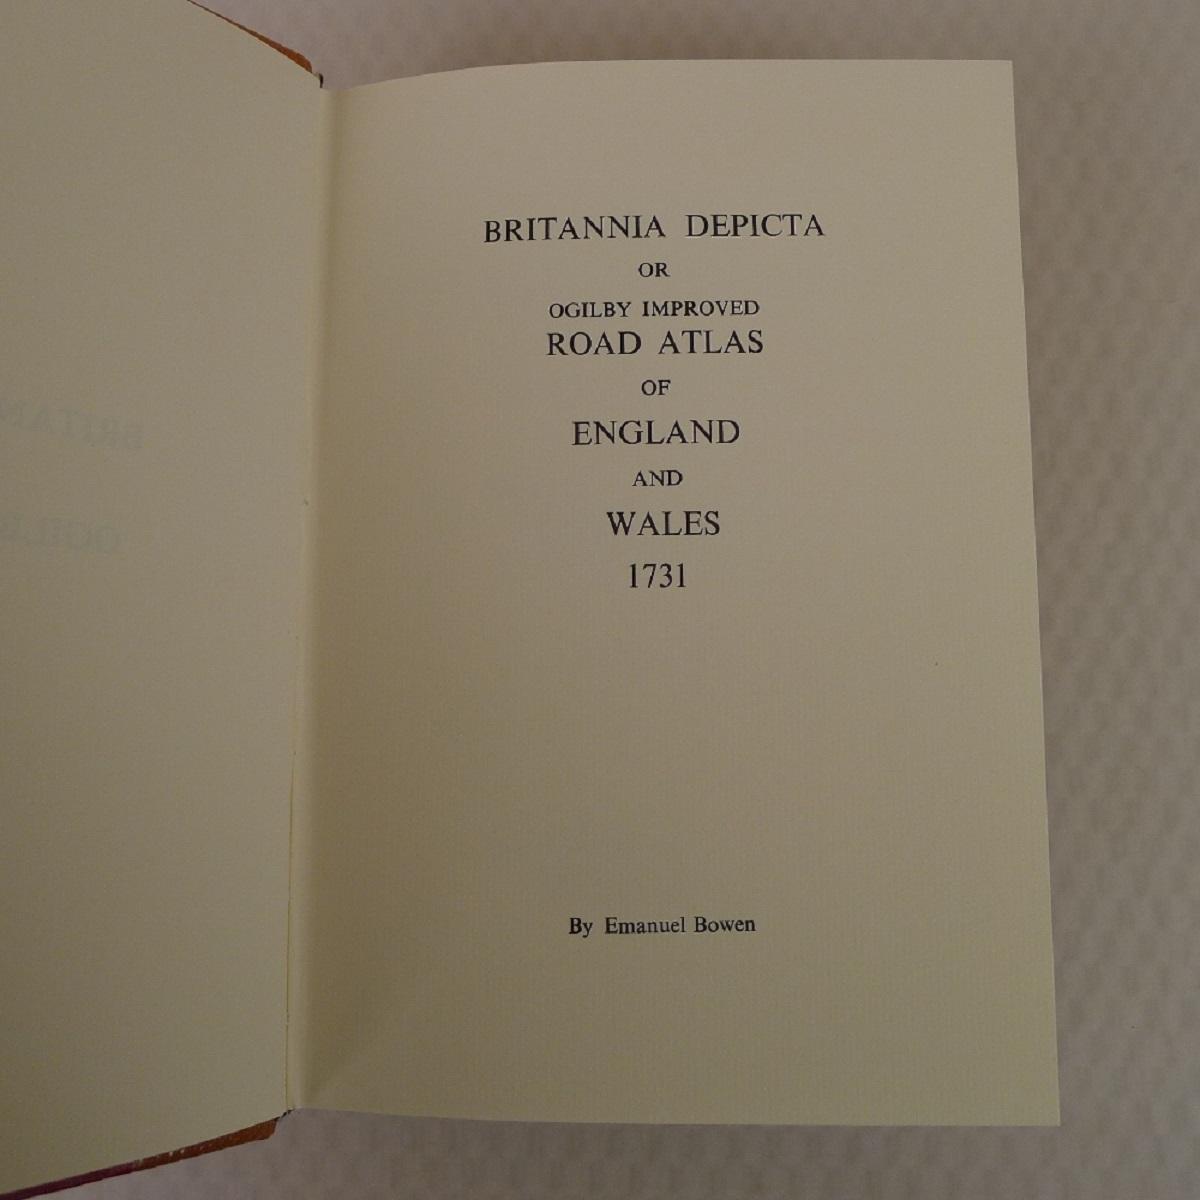 A facsimile reprint of Britannia Depicta 1731 by Emmanuel Bowen published by Britannia - Image 4 of 7